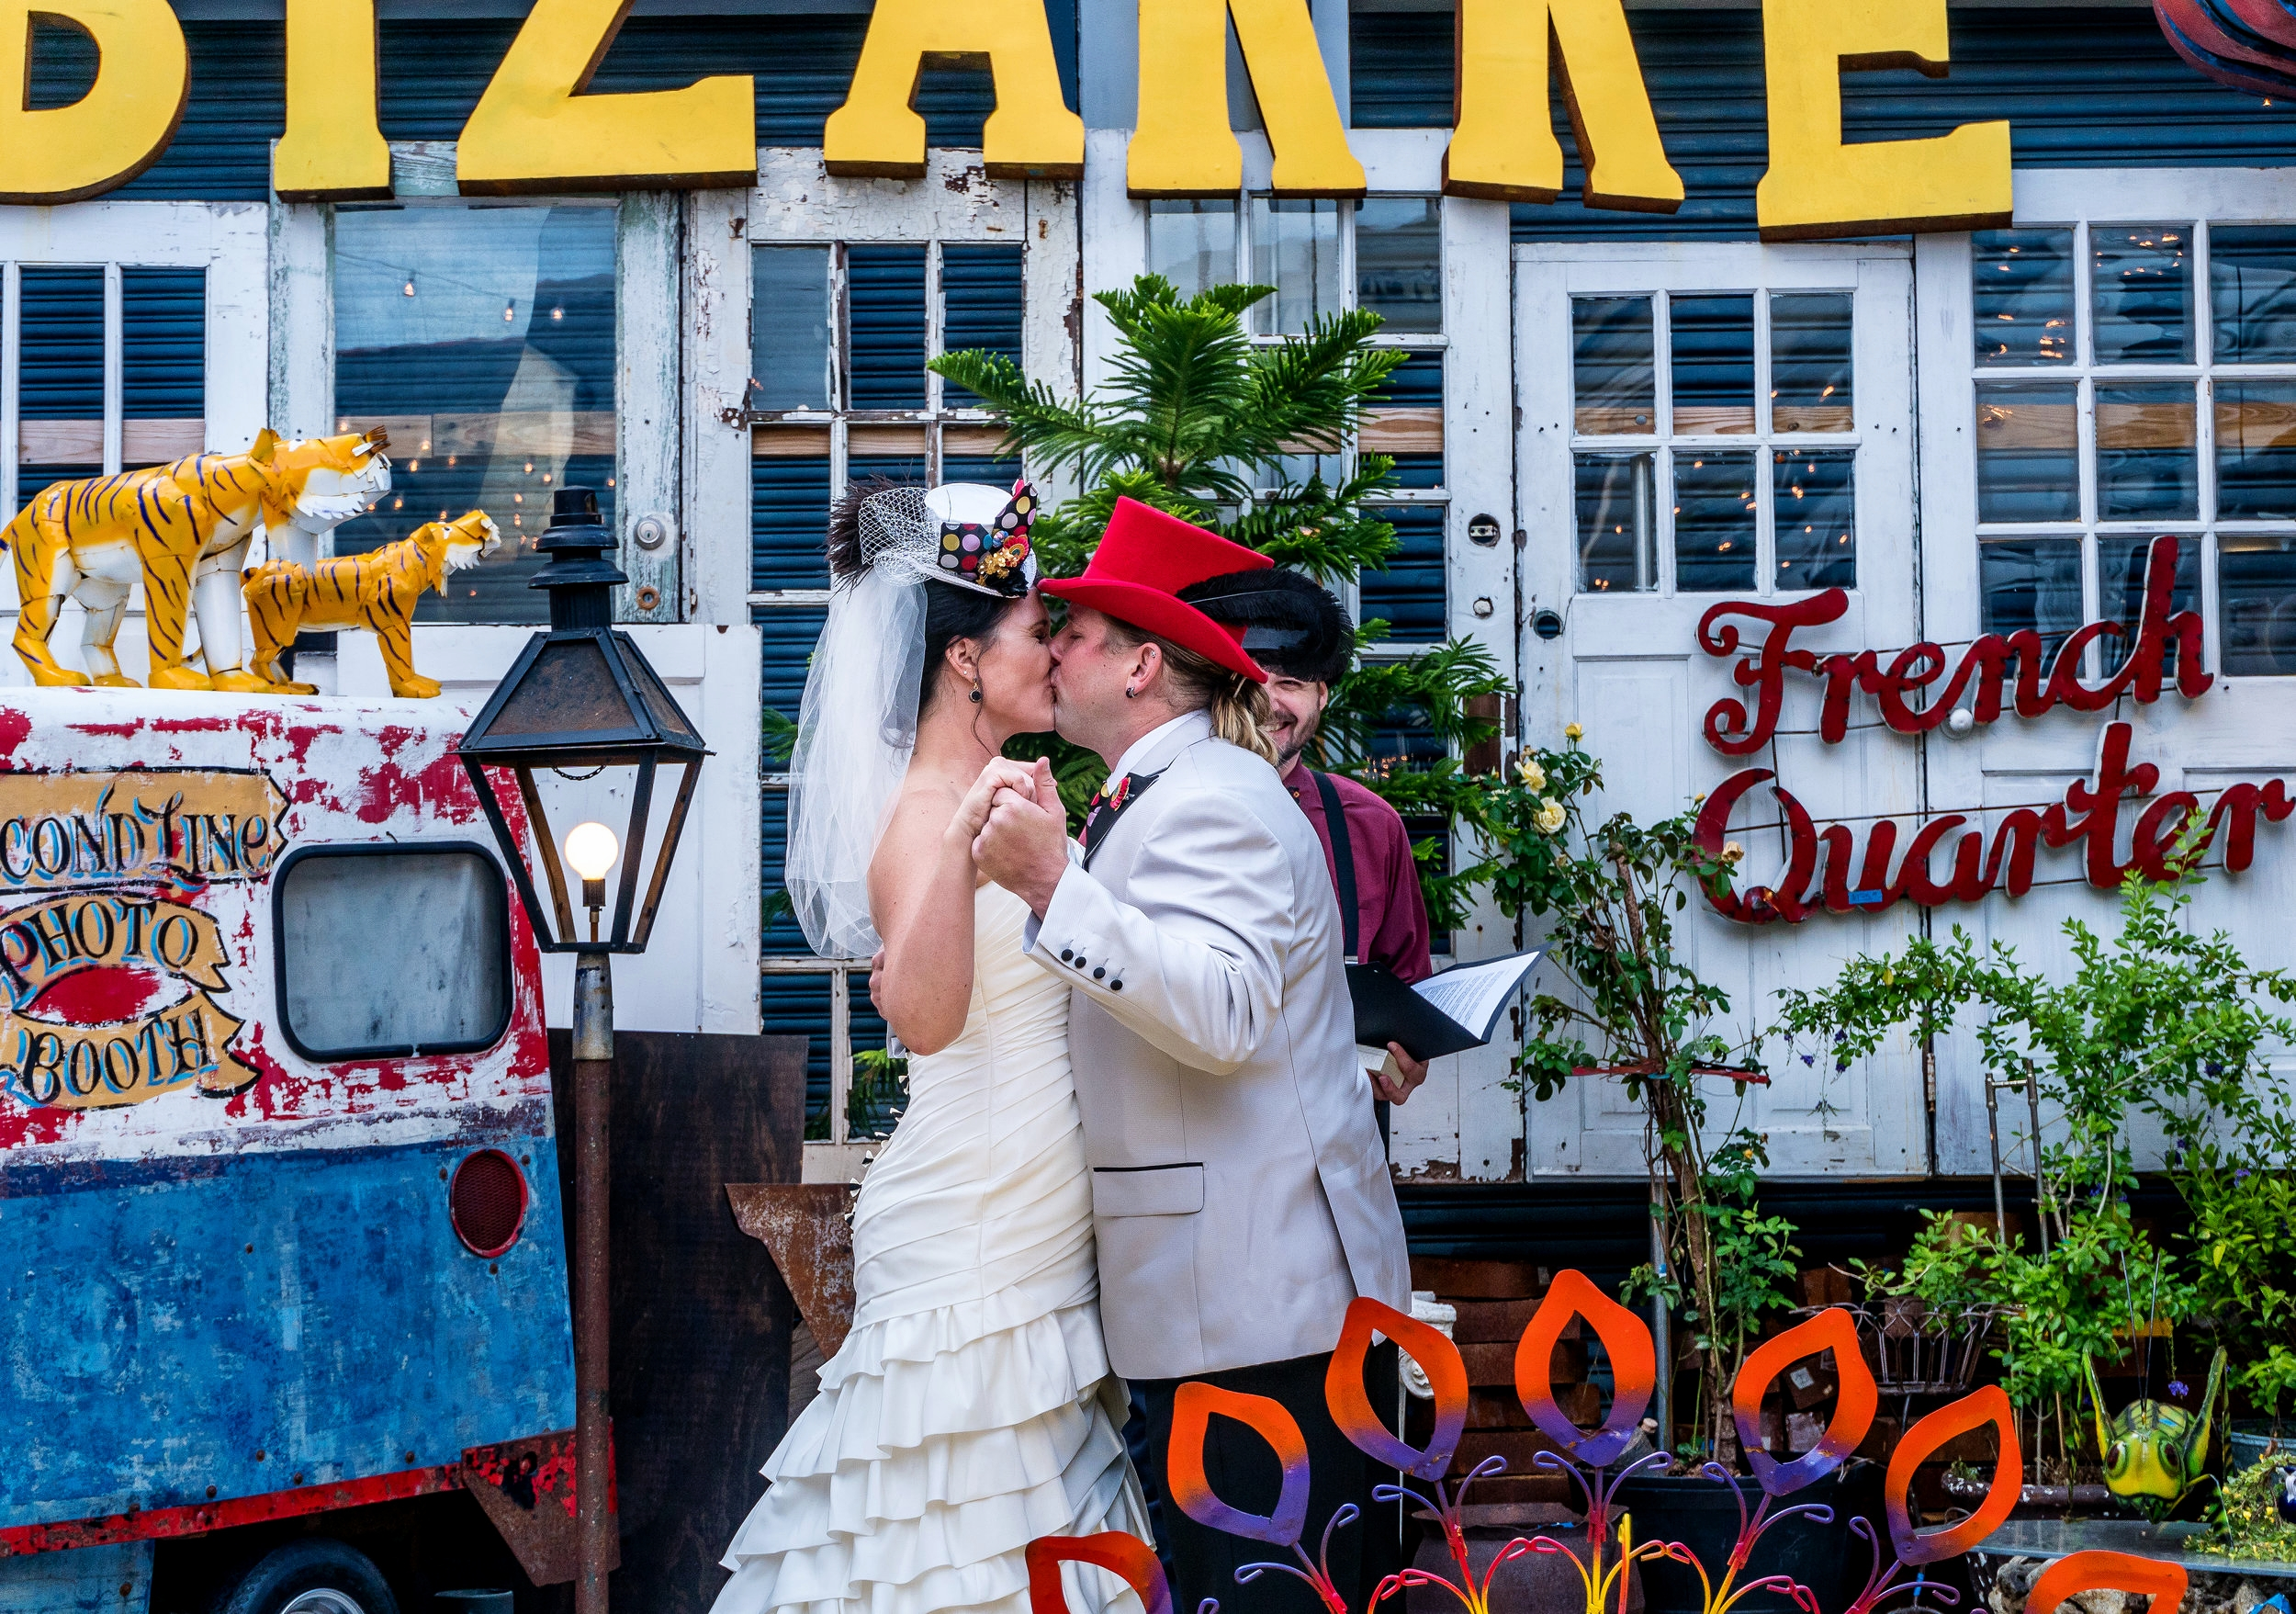 bride_groom_kissing_ceremony_new_orleans.jpg